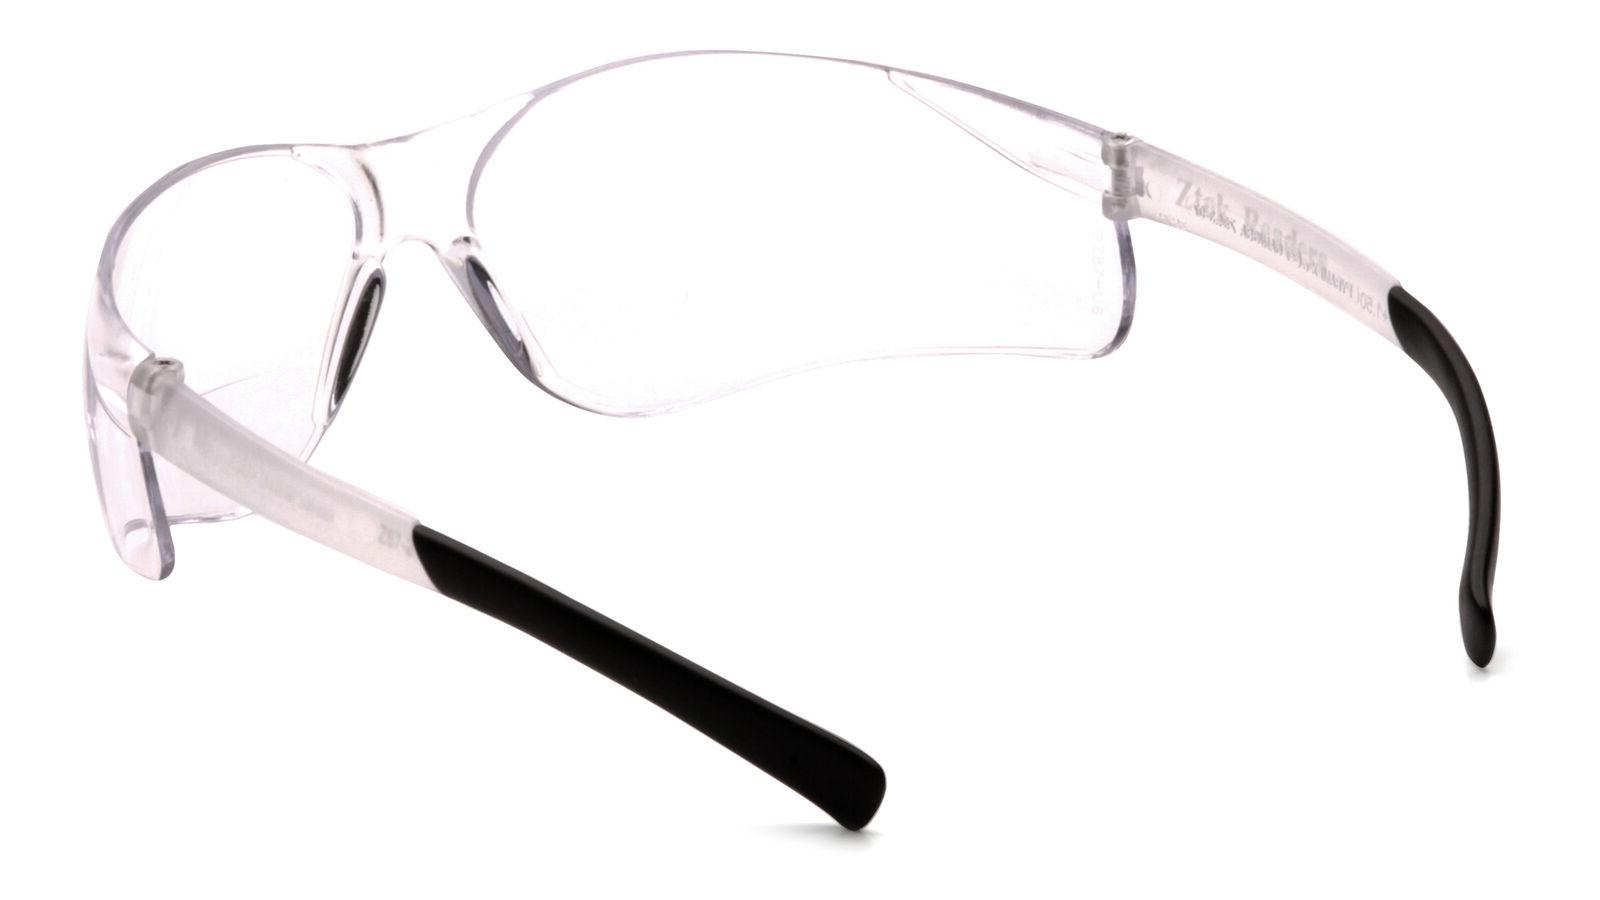 Glasses, Magnification & Bi-Focal